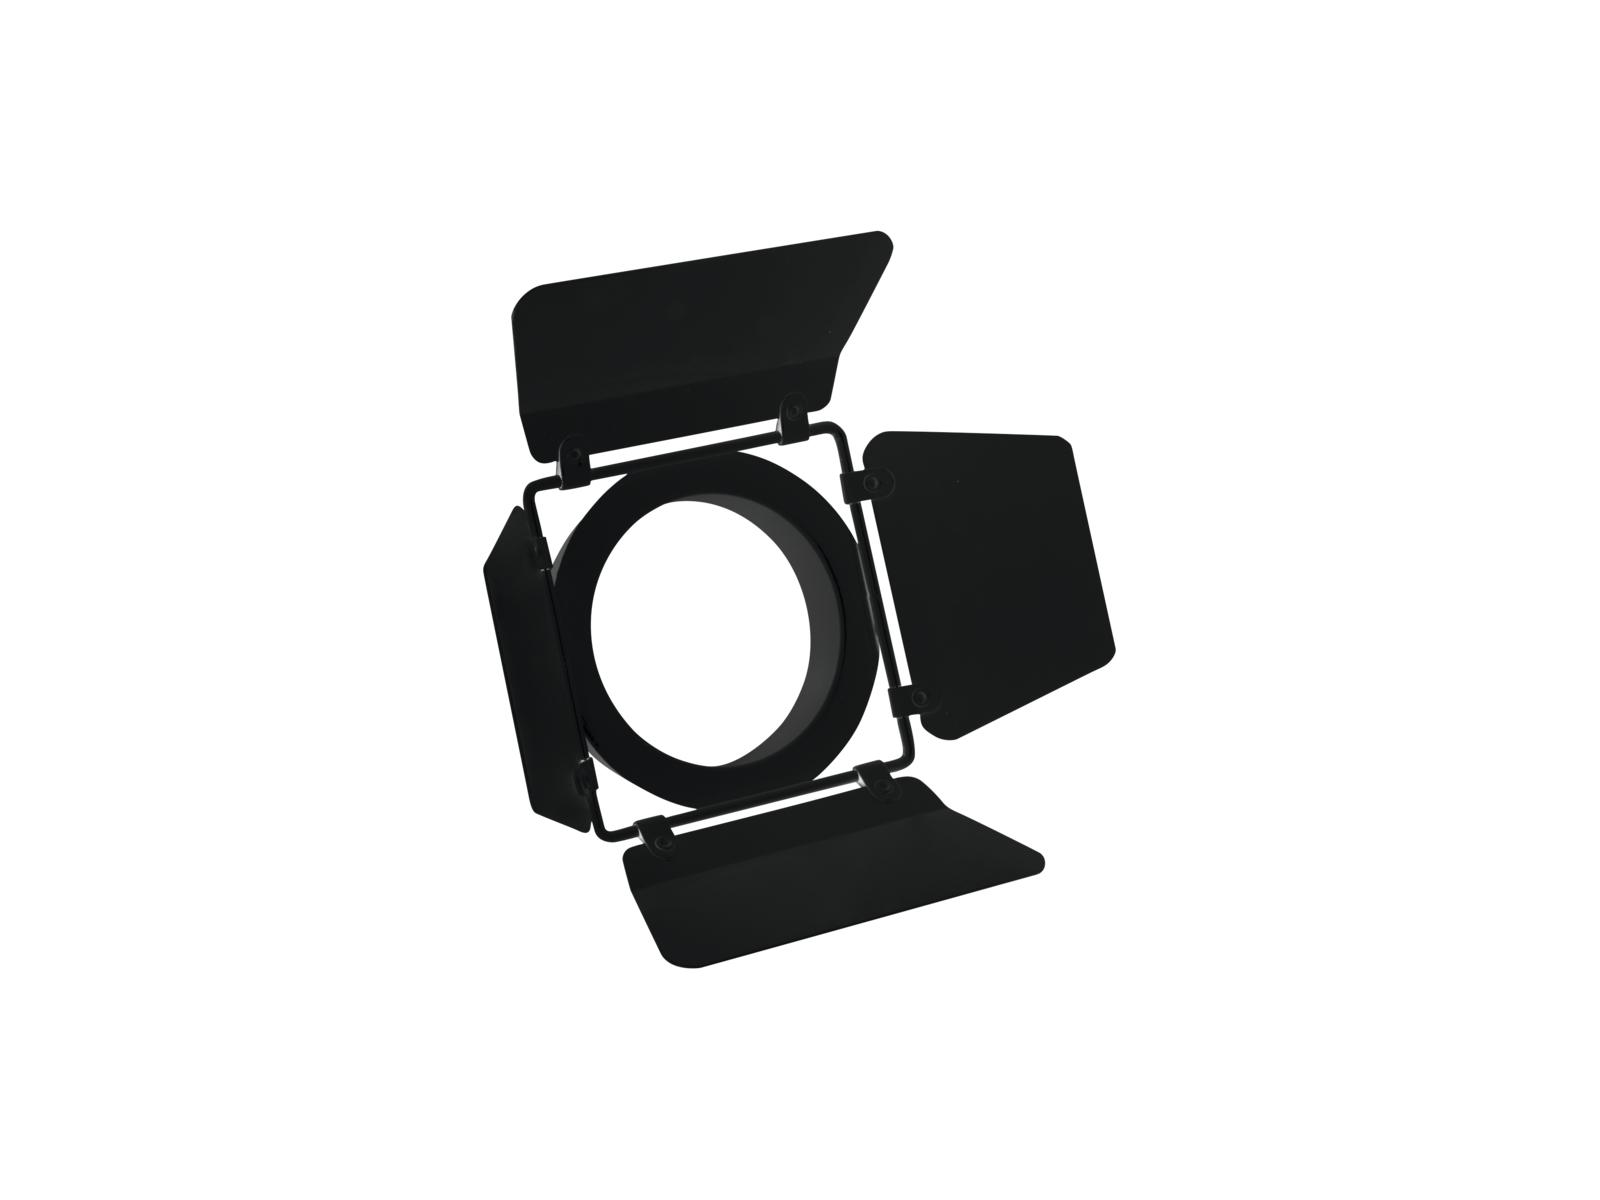 Eurolite klapky pro THA-20PC TRC, černé